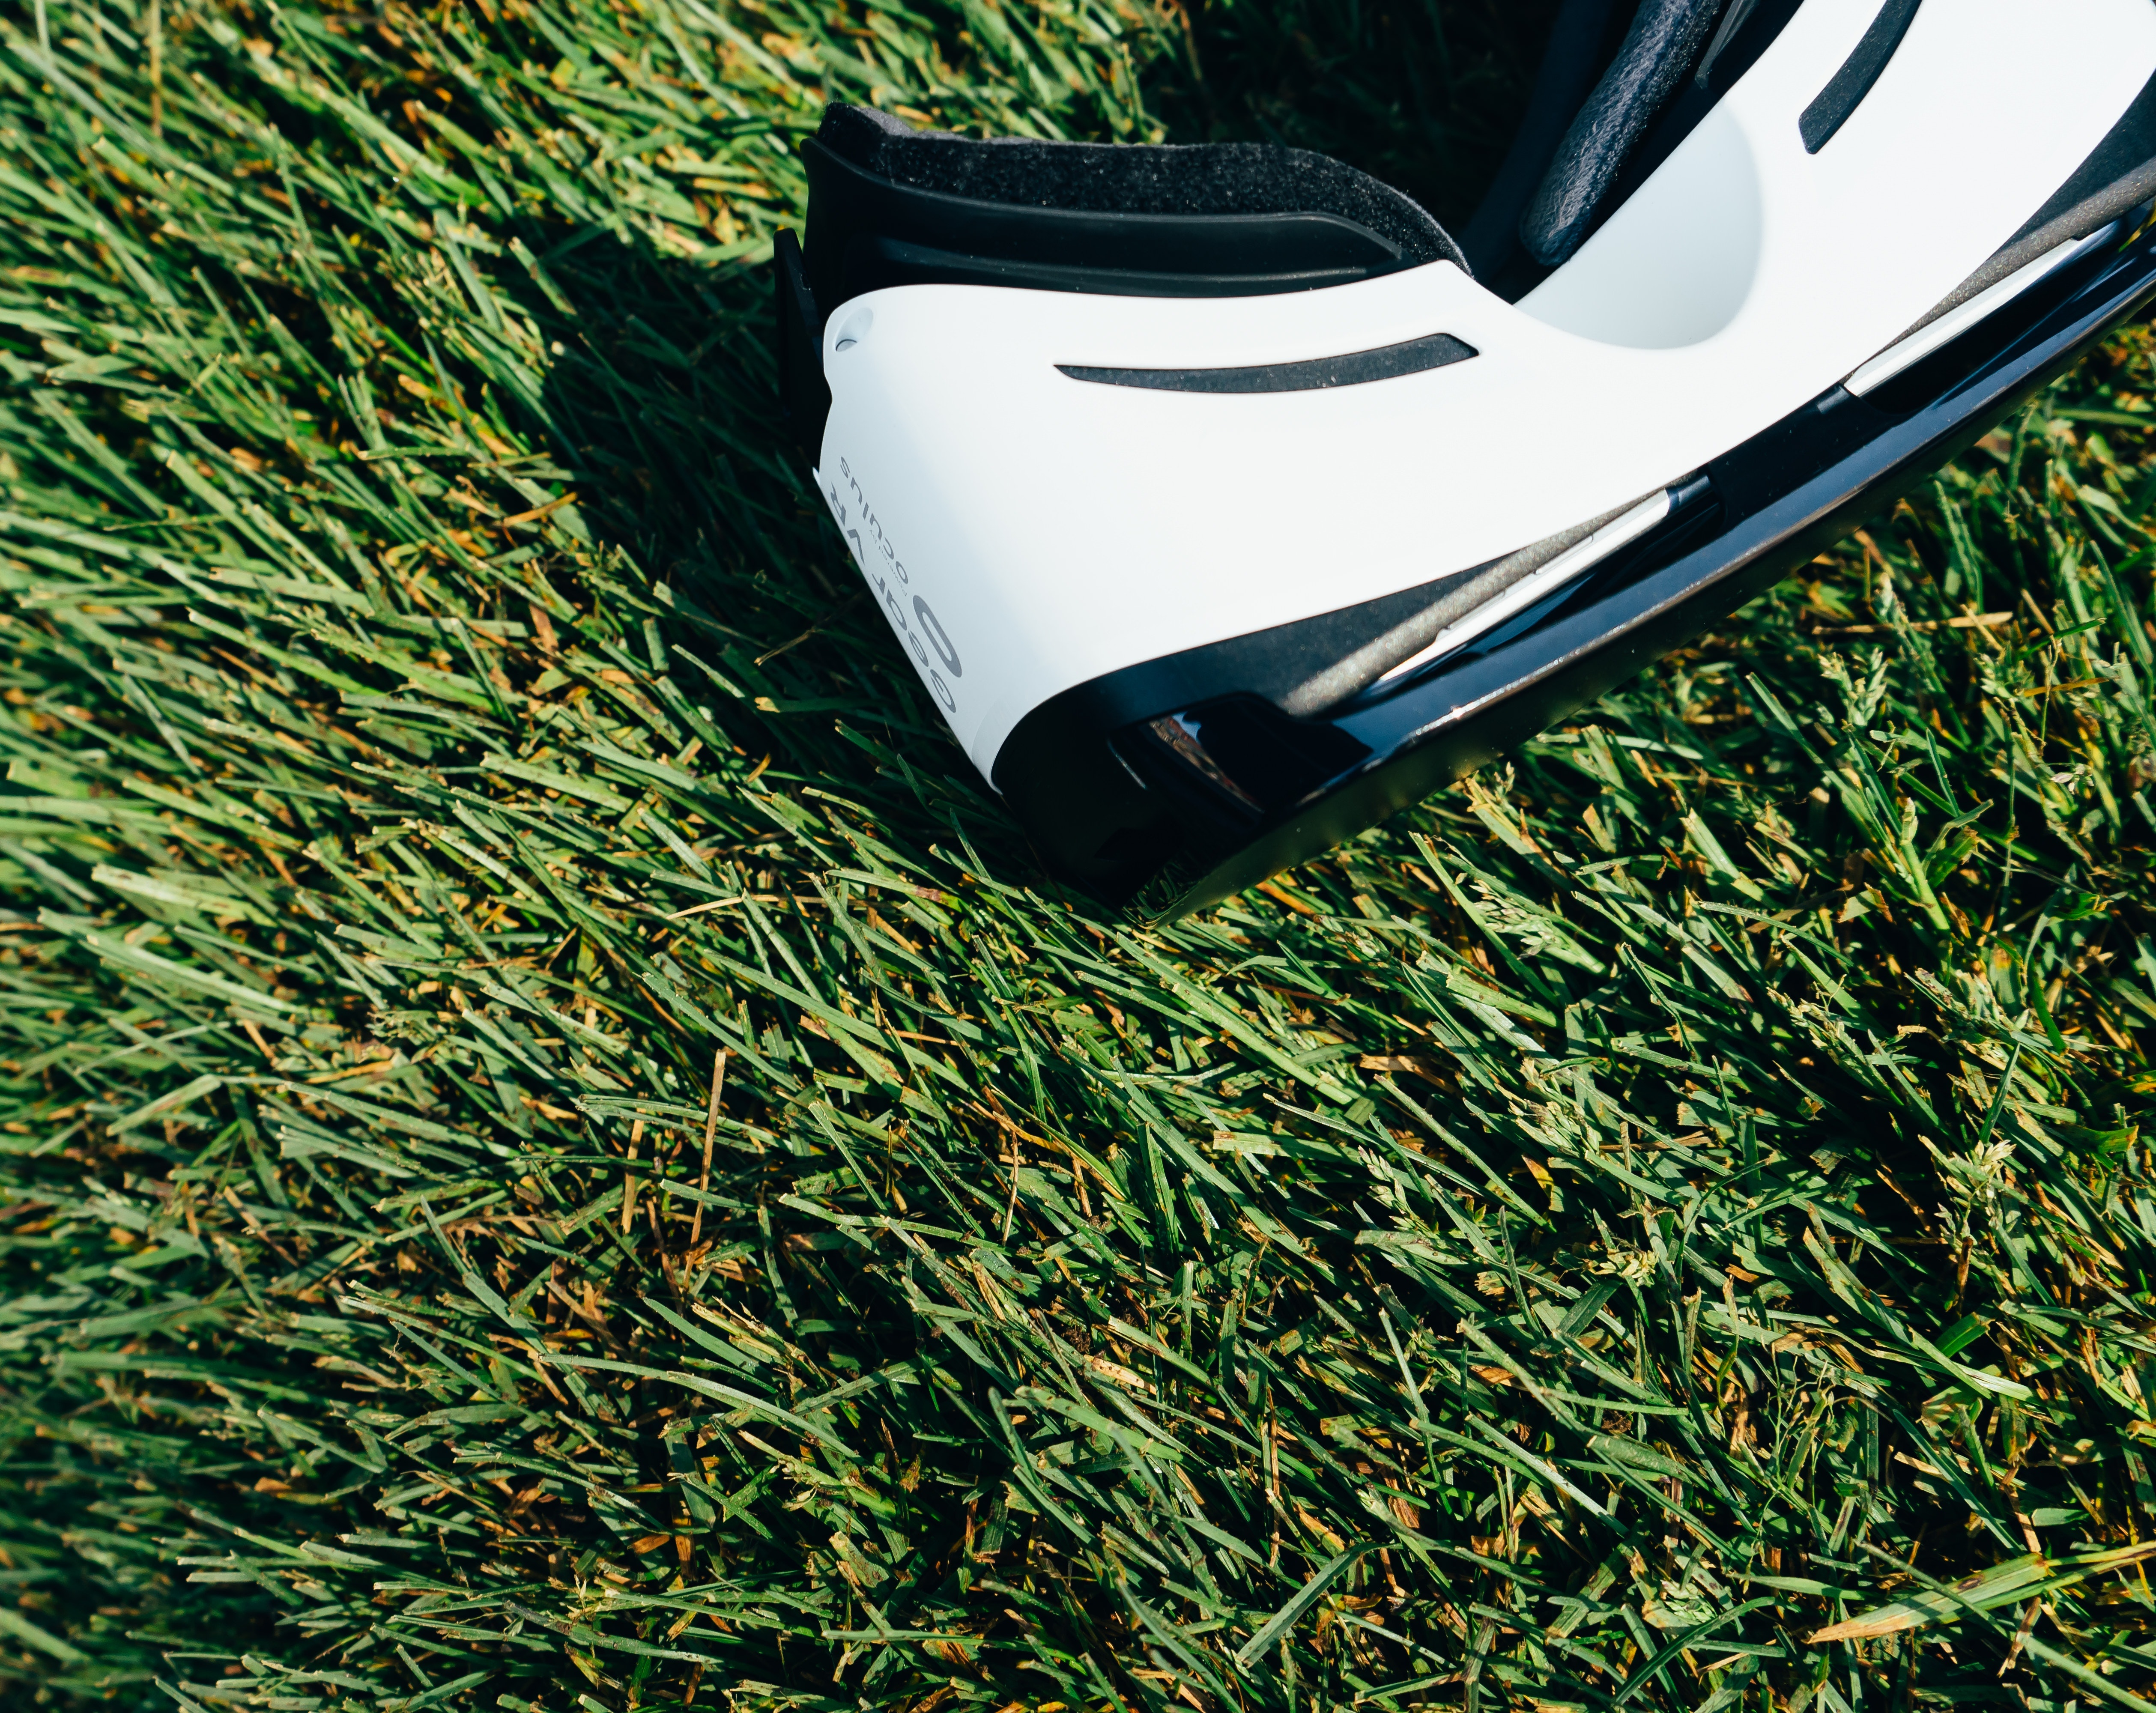 vr headset on grass